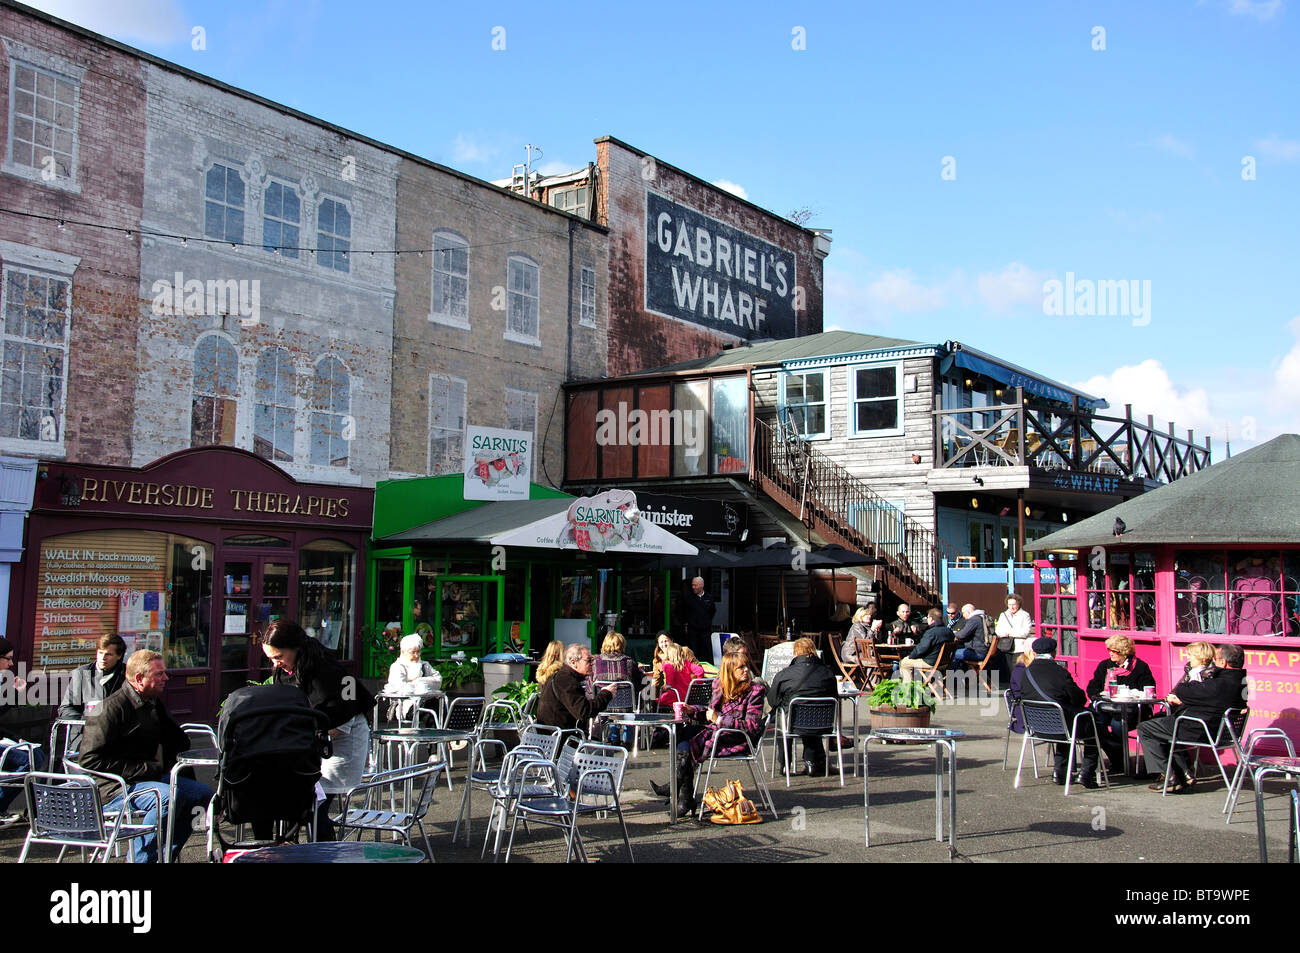 Gabriel S Wharf Restaurants Southbank